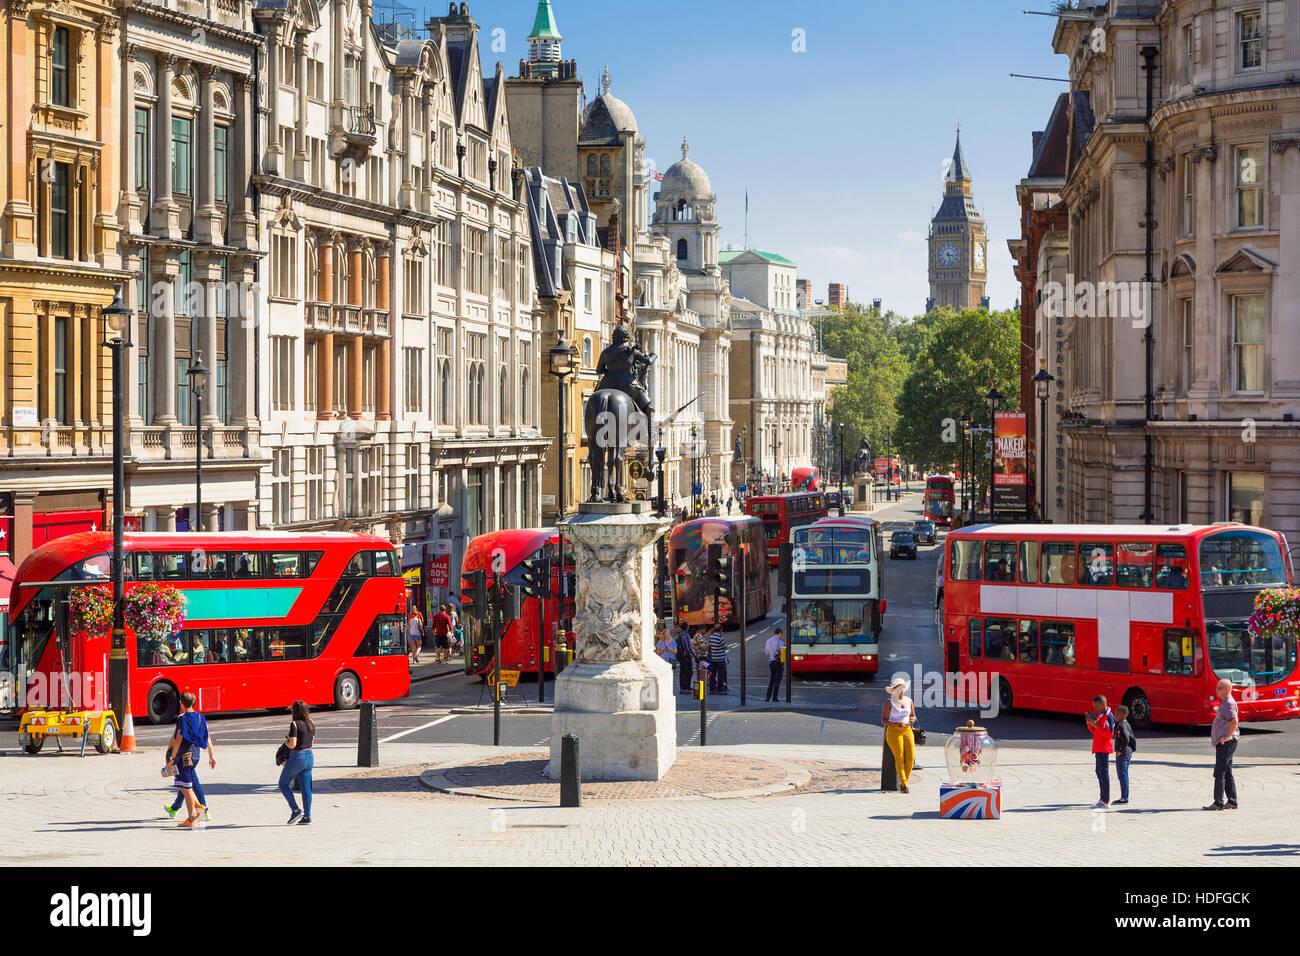 LONDON, Vereinigtes Königreich - Verkehr am Trafalgar square Stockbild